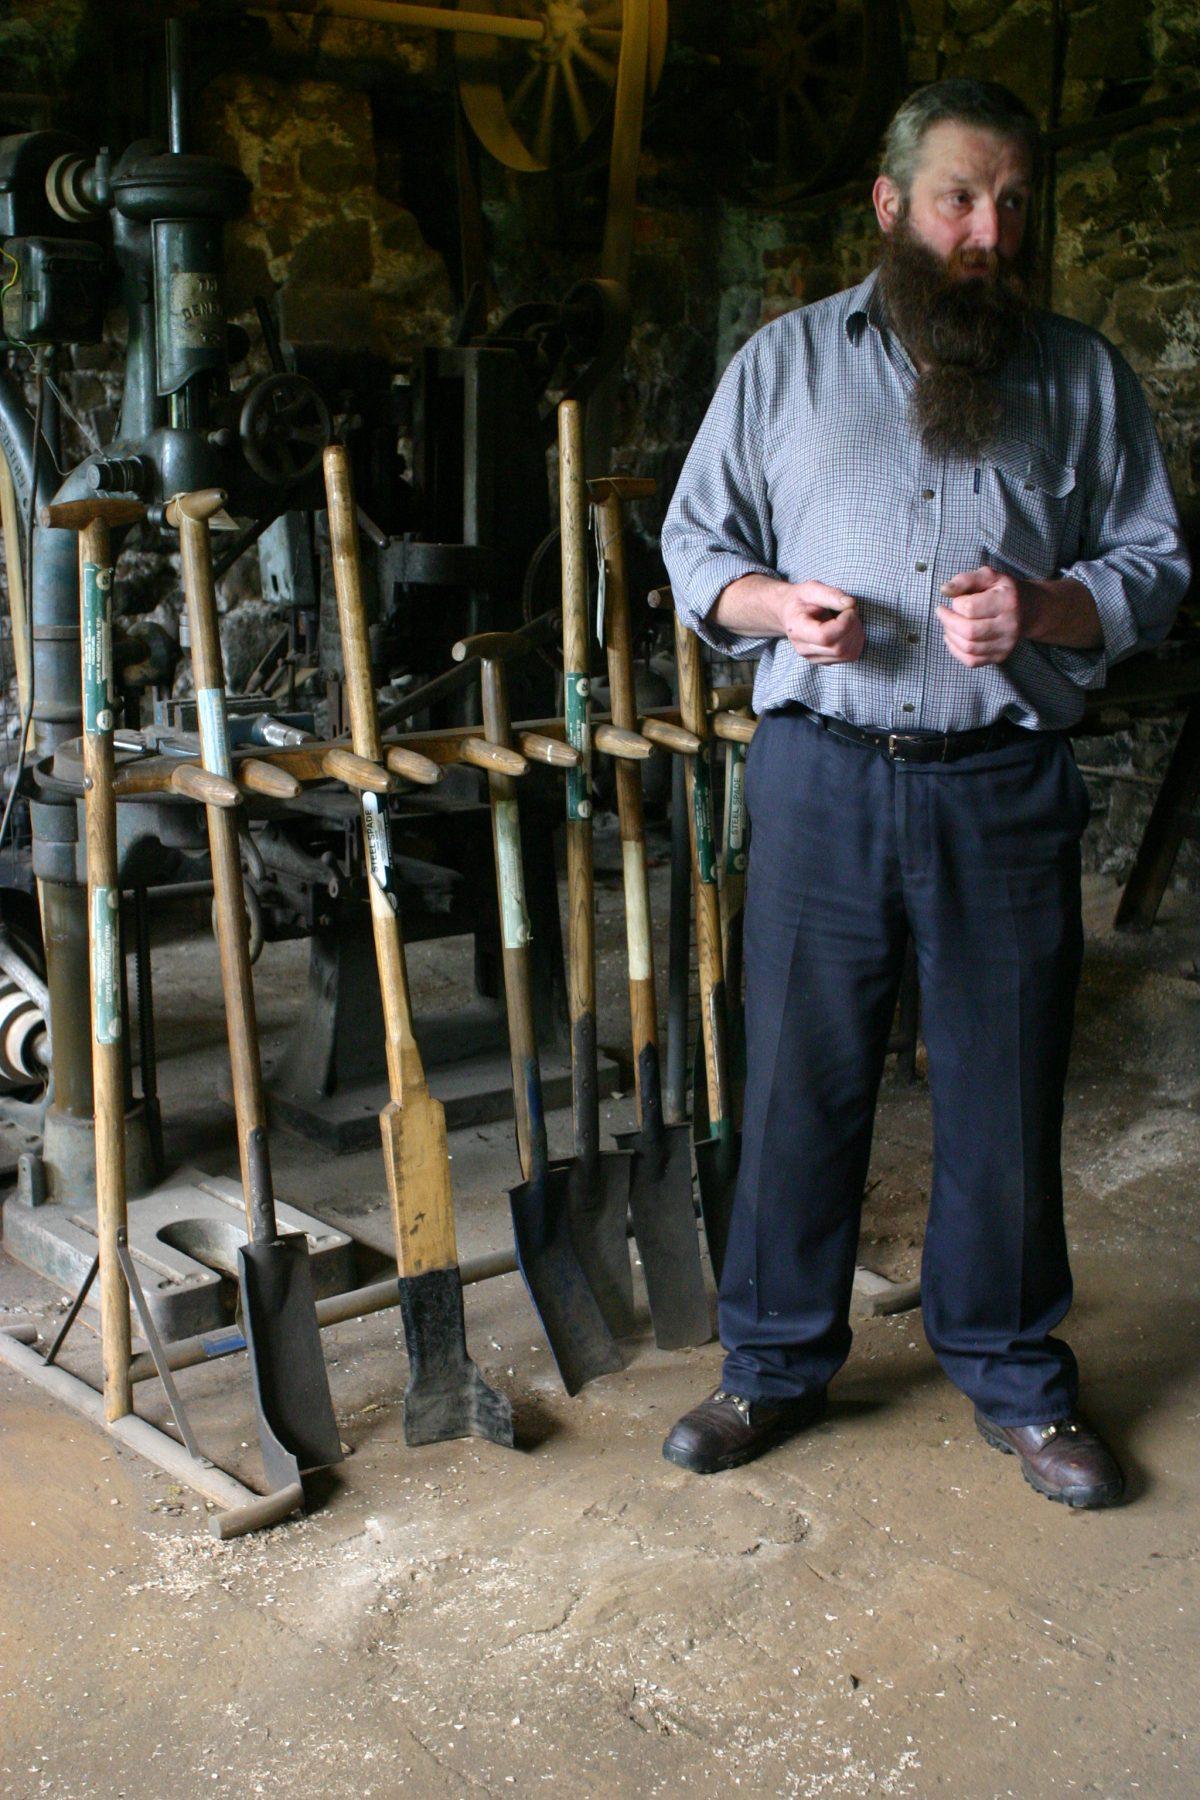 Spades handmade and man